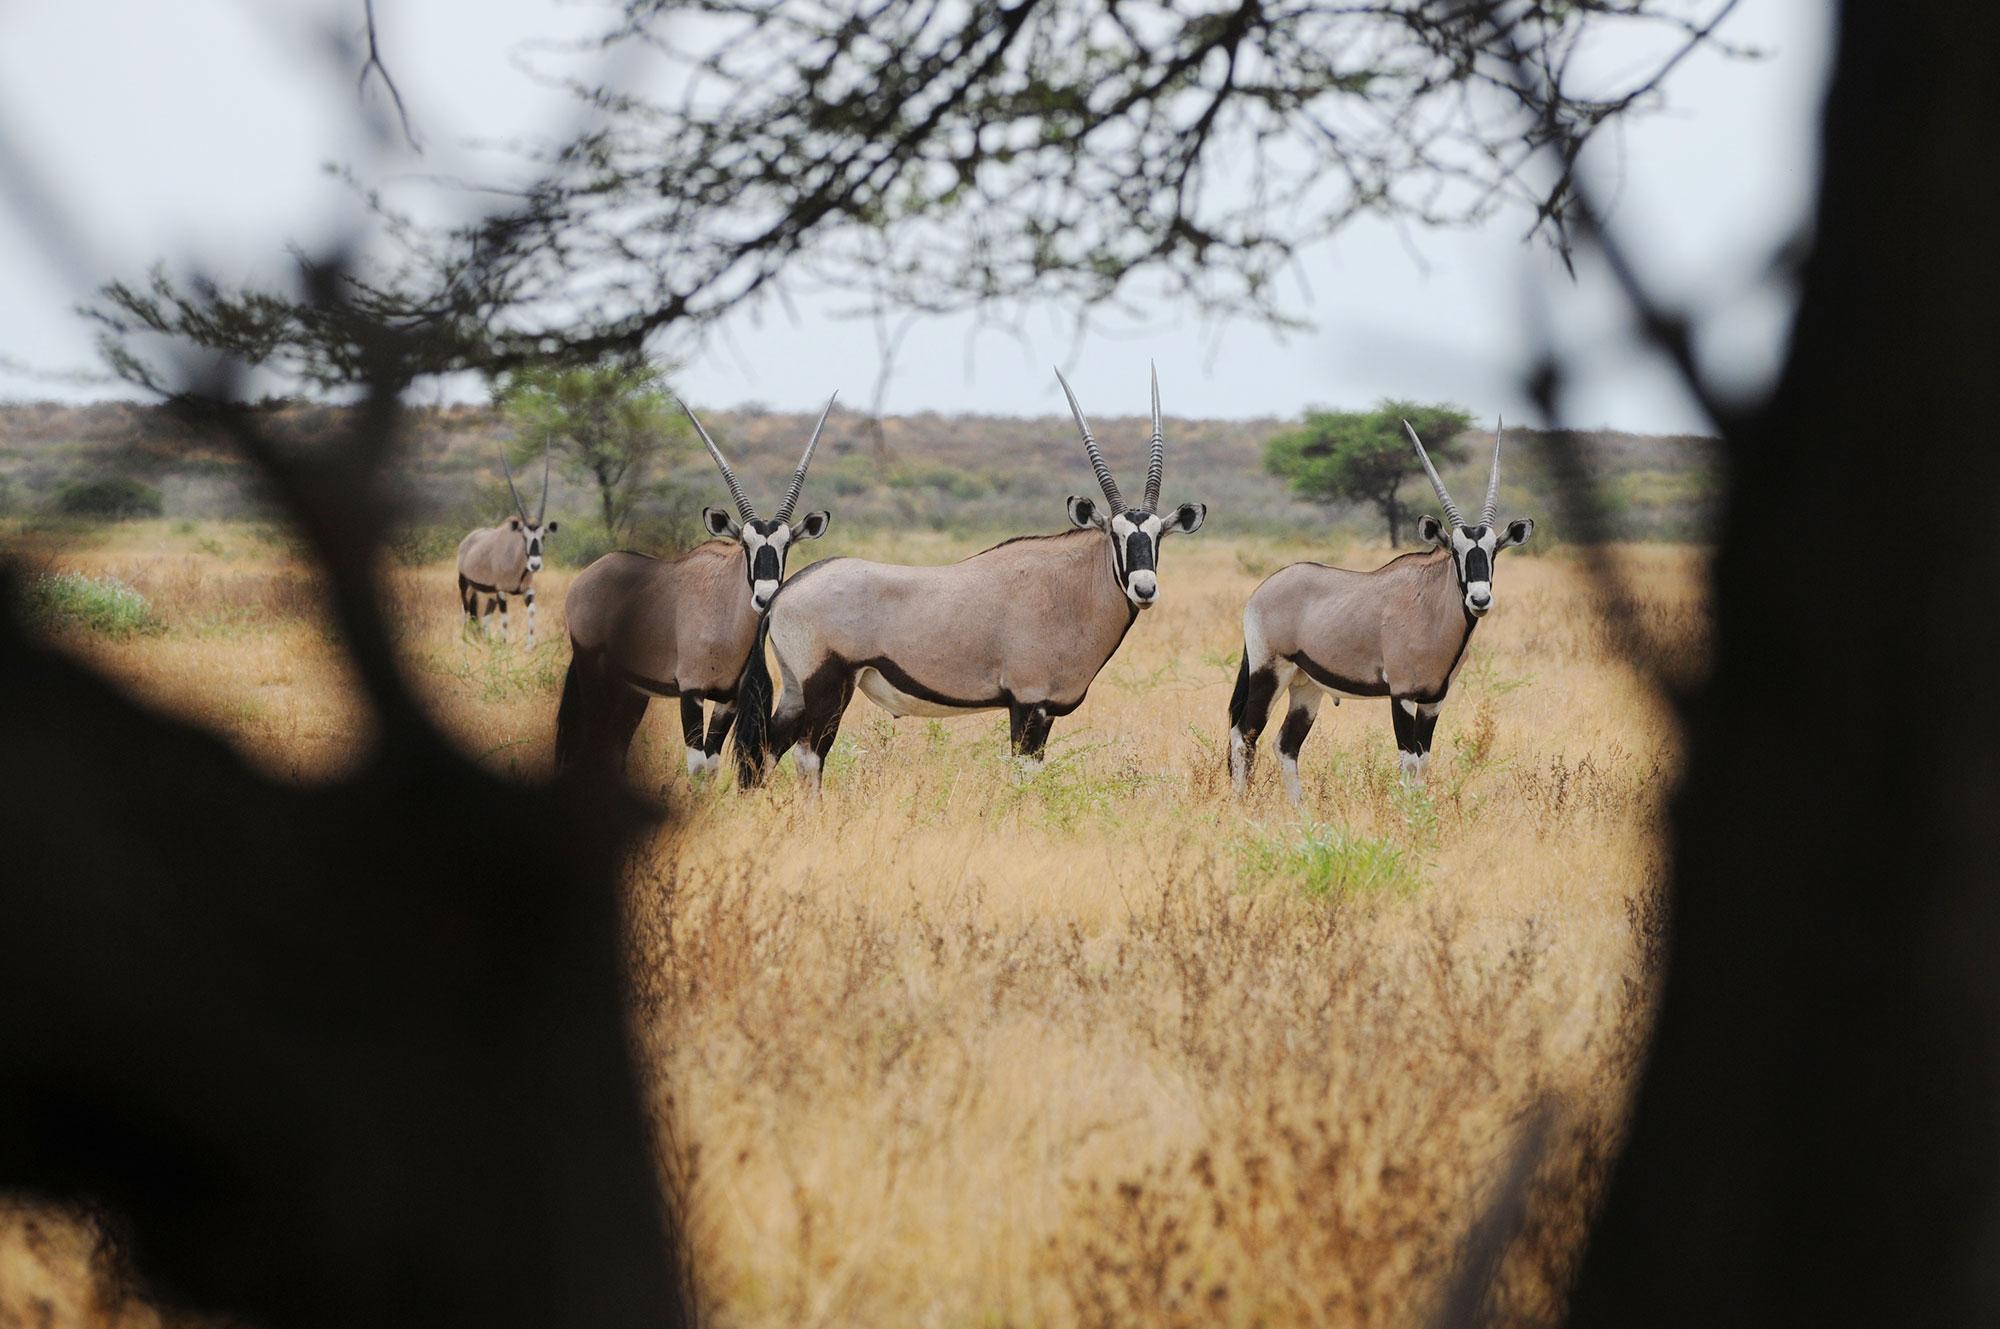 orix in etosha natural park during a namibia safari